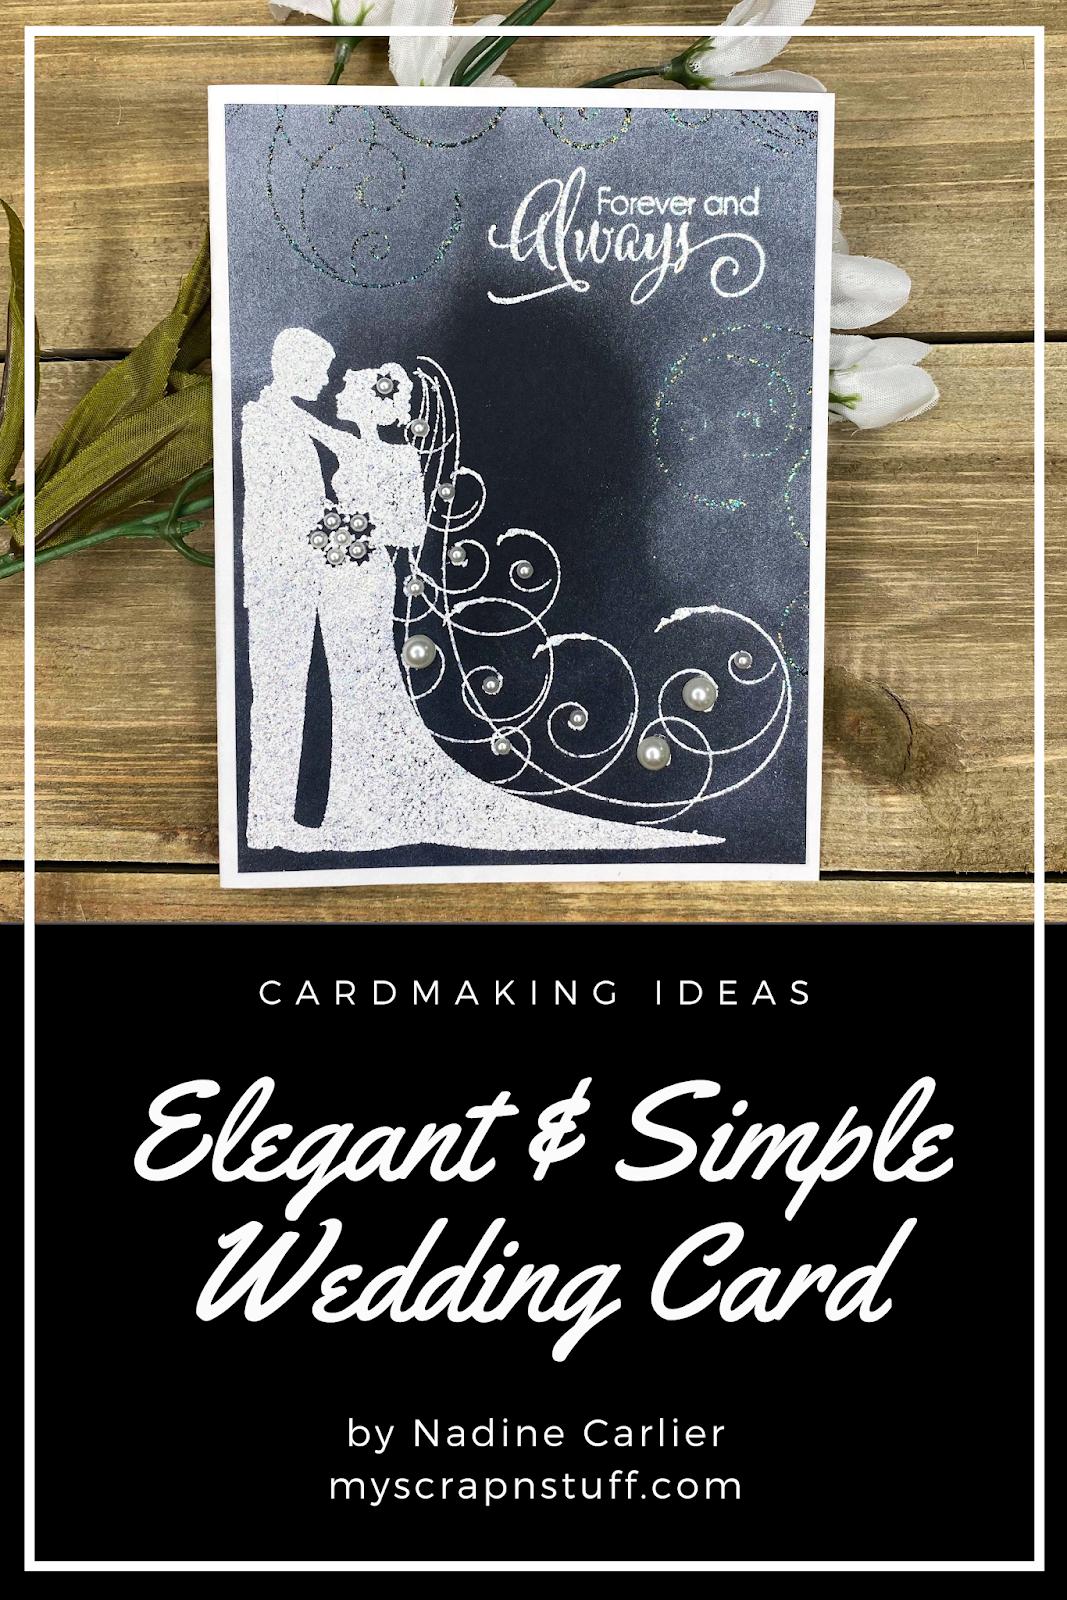 nadine carlier simple  elegant wedding card